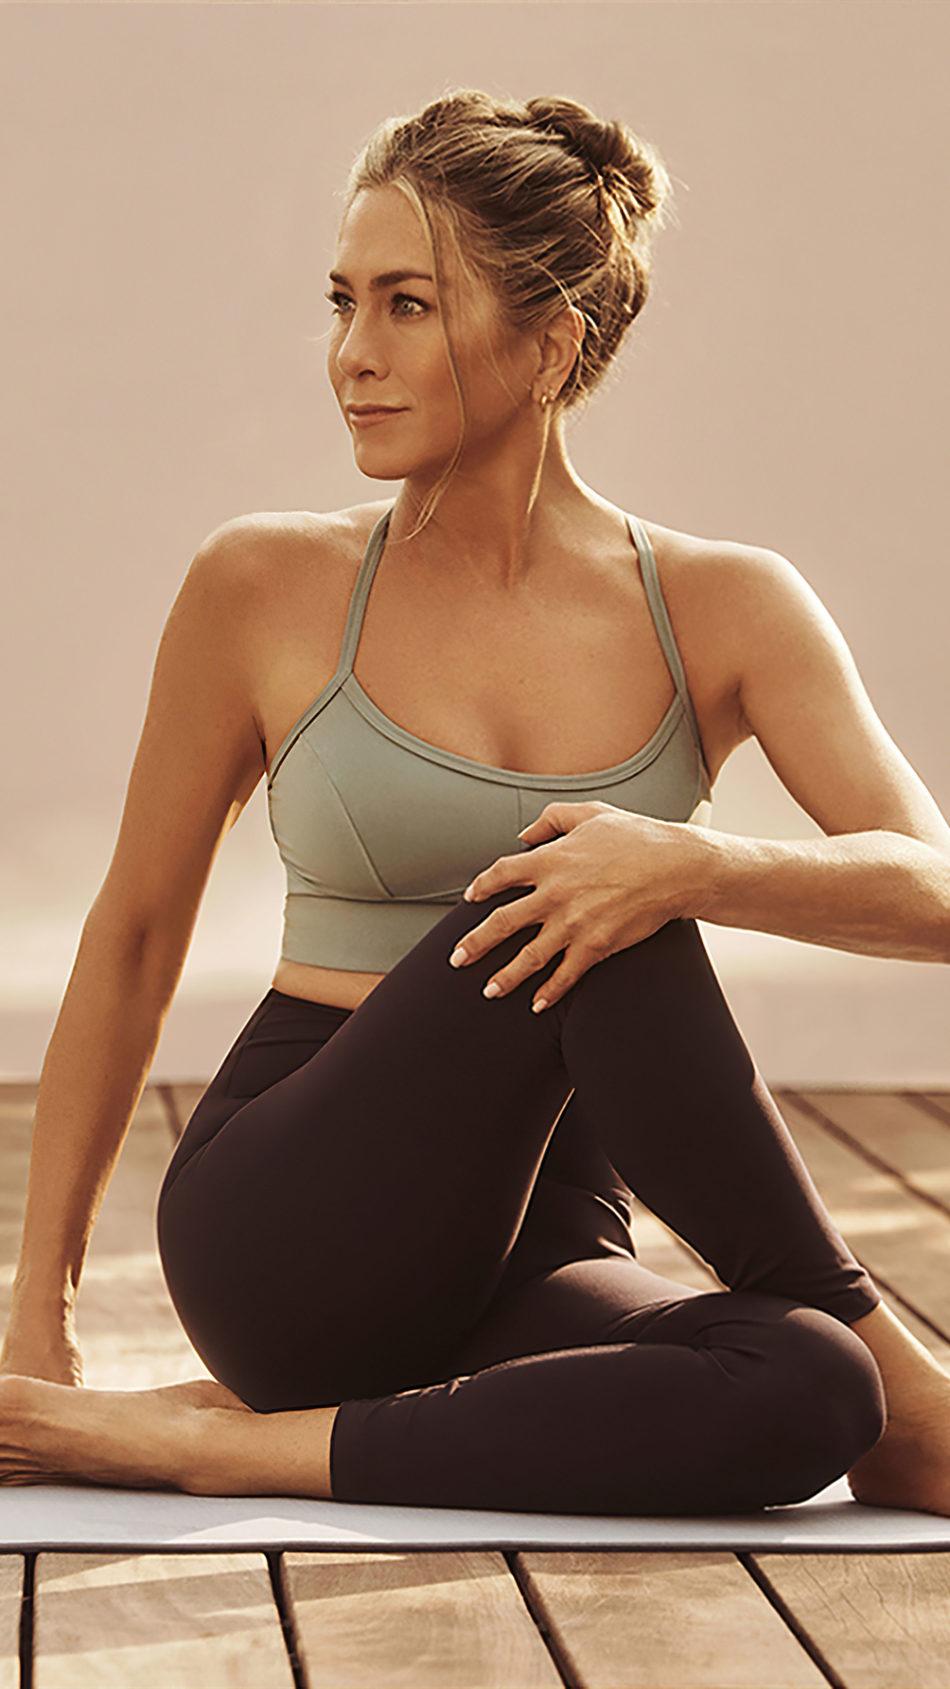 Jennifer Aniston 2021 4K Ultra HD Mobile Wallpaper